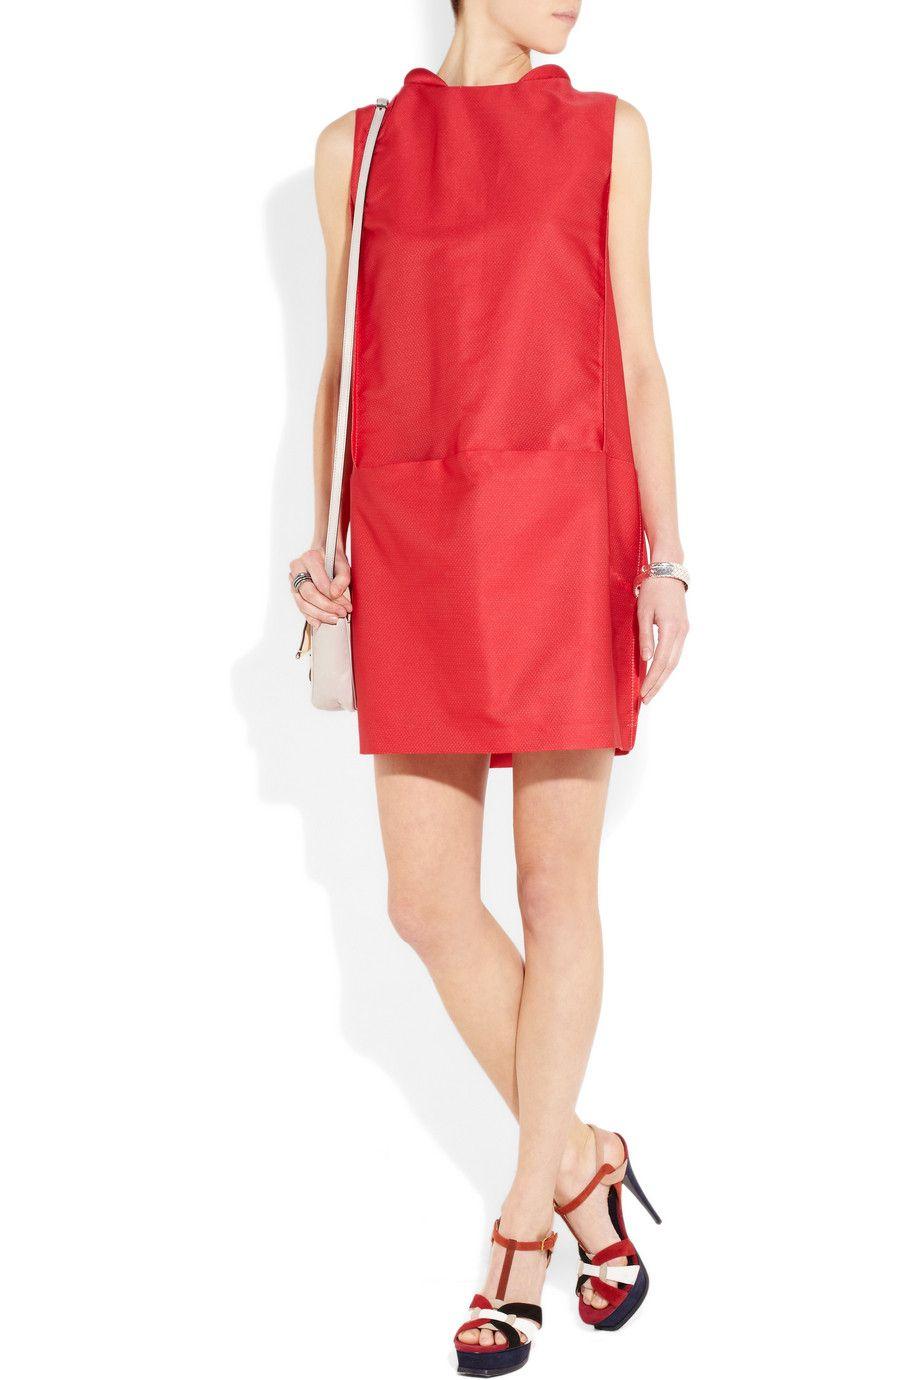 Tomato Red Jacquard Cocoon Mini Dress Victoria Victoria Beckham Cute Red Dresses Fashion Victoria Dress [ 1380 x 920 Pixel ]